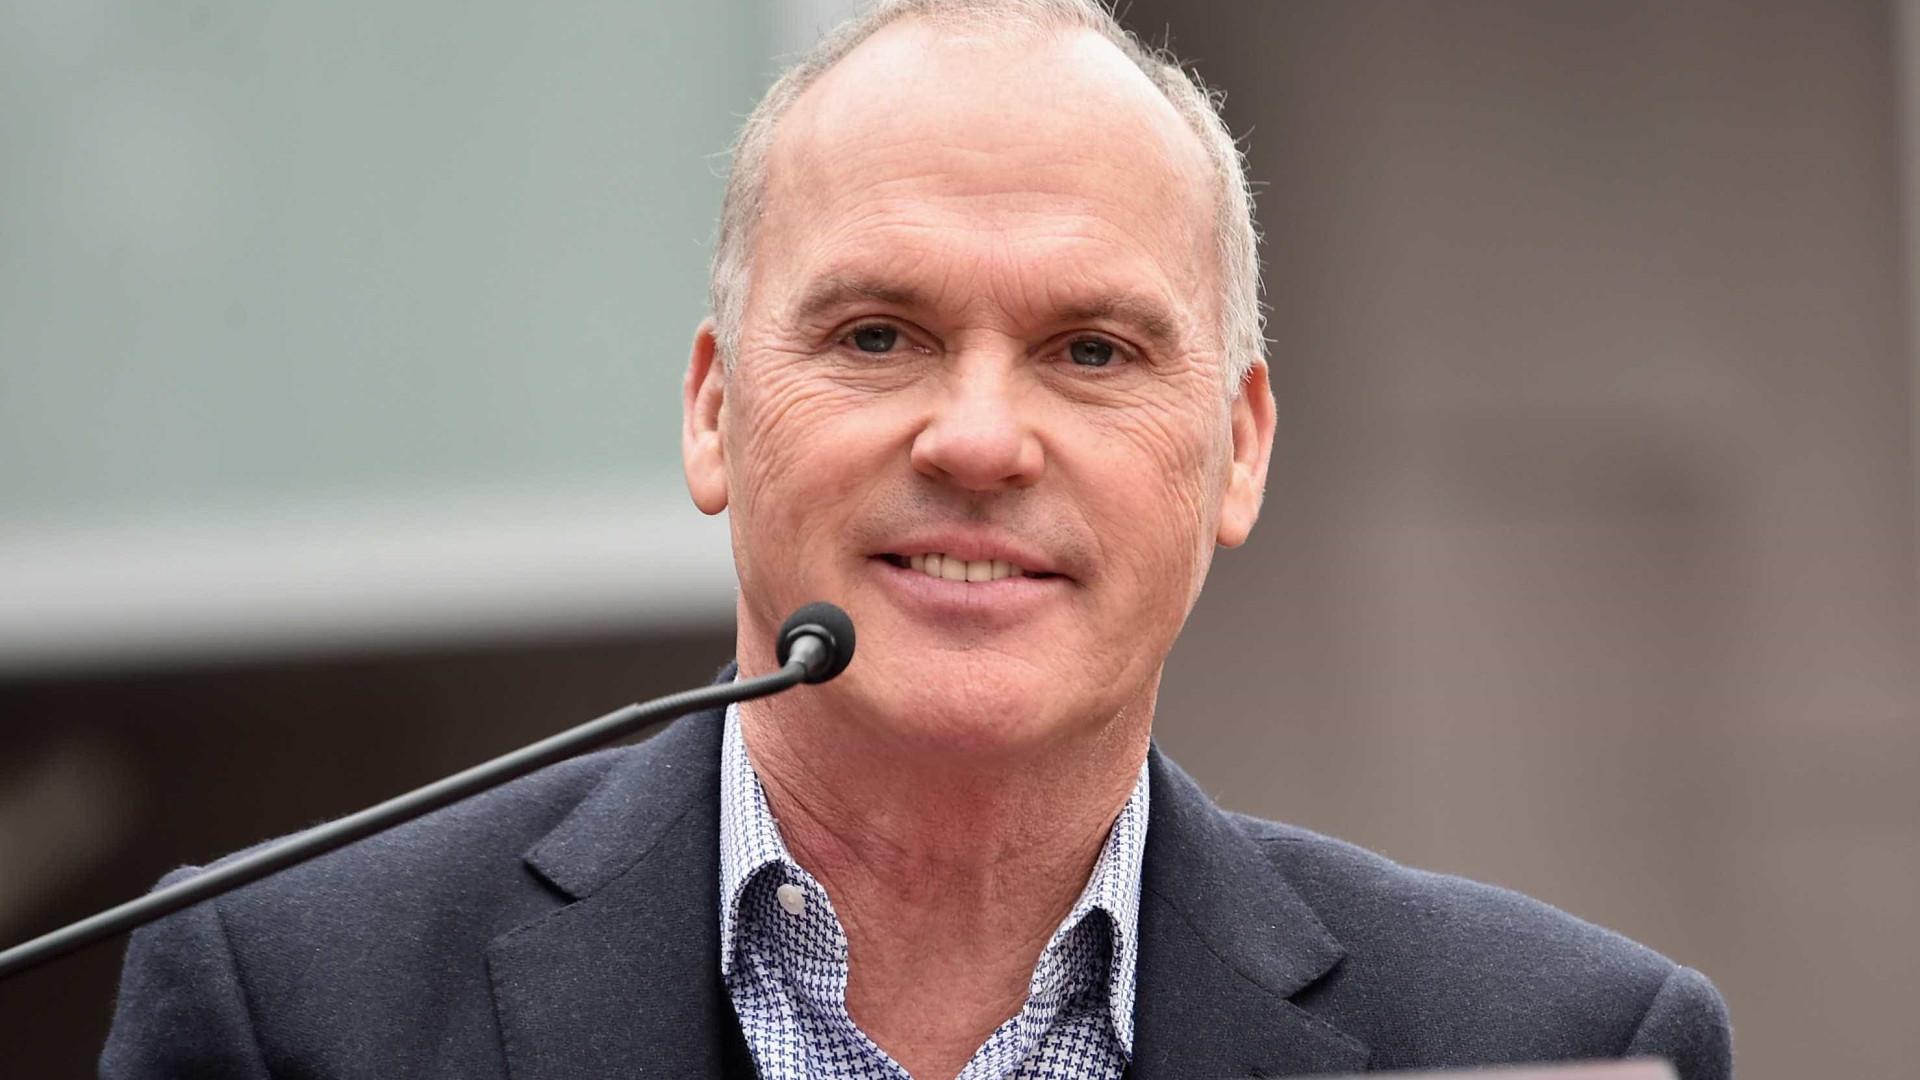 Michael Keaton termina discurso a universitários de forma hilariante